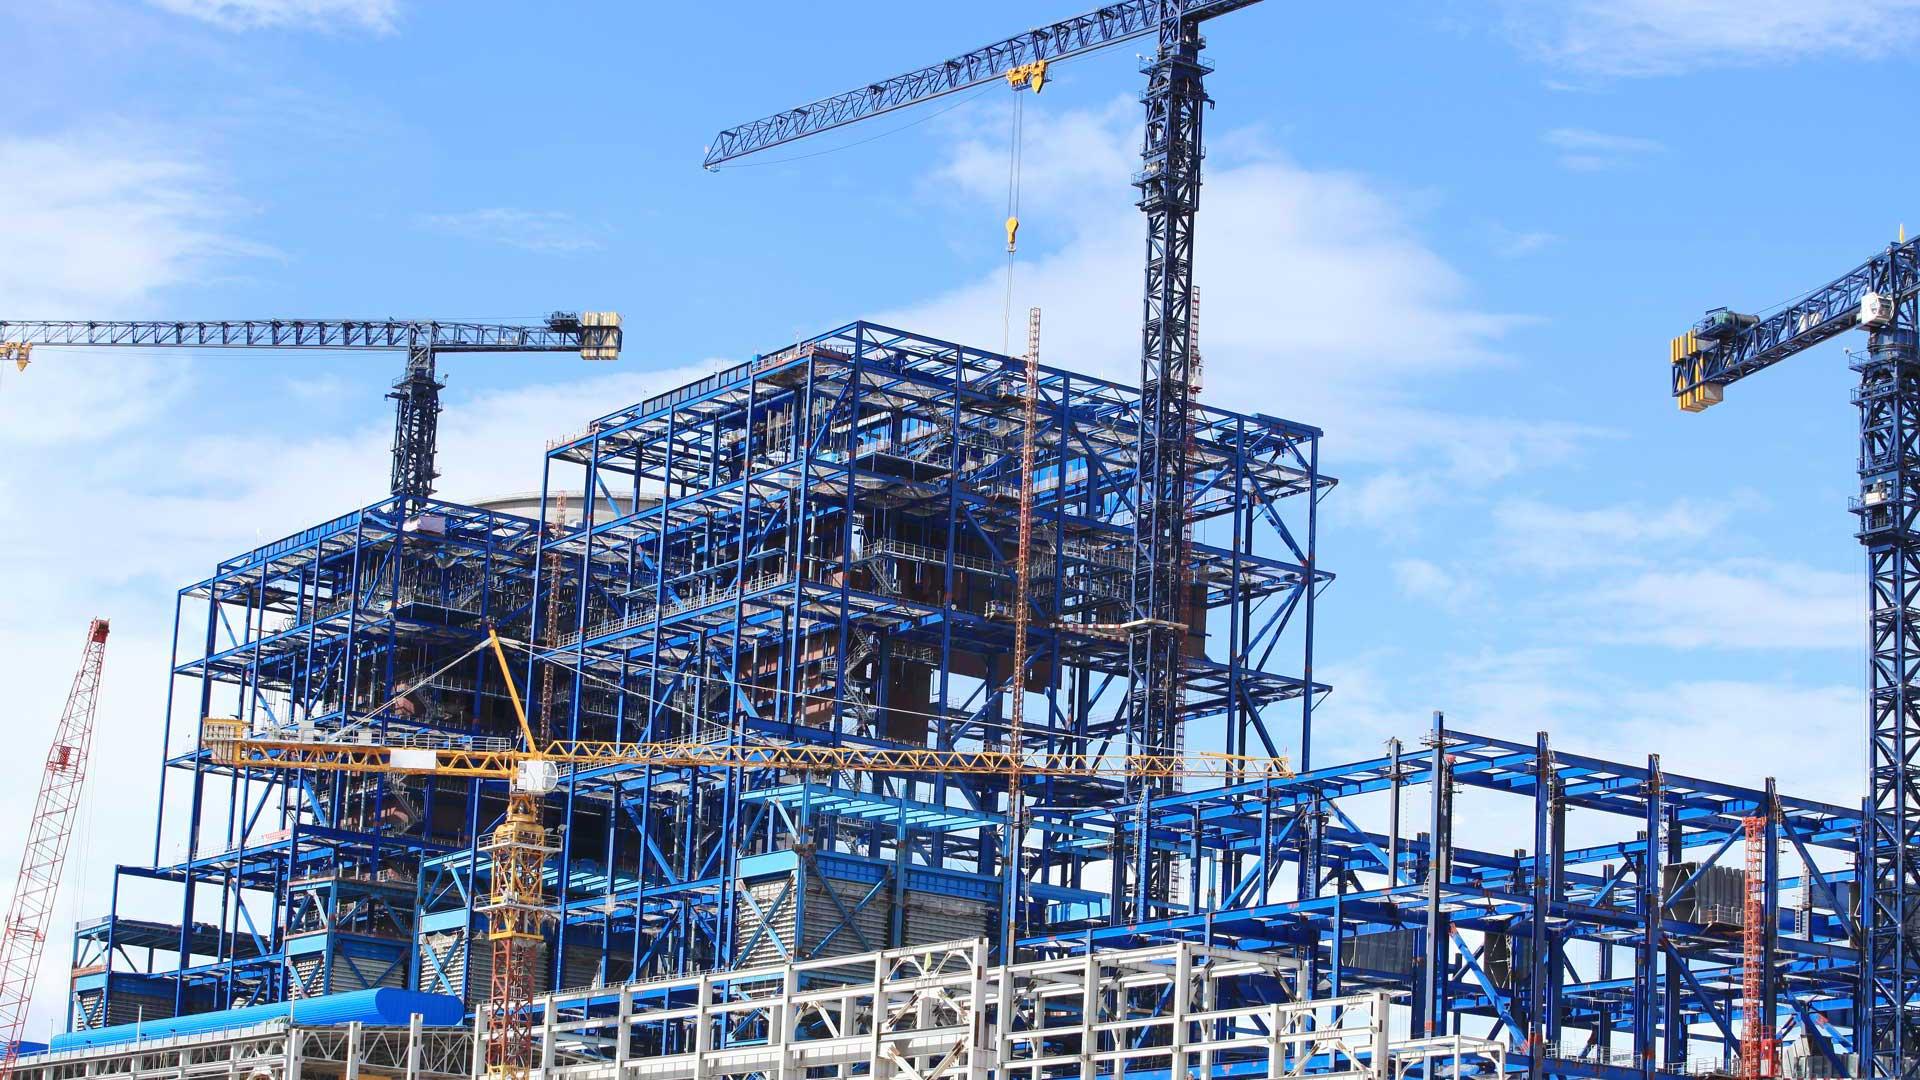 Bg Construction Site 171 The Environmental Law Group Ltd